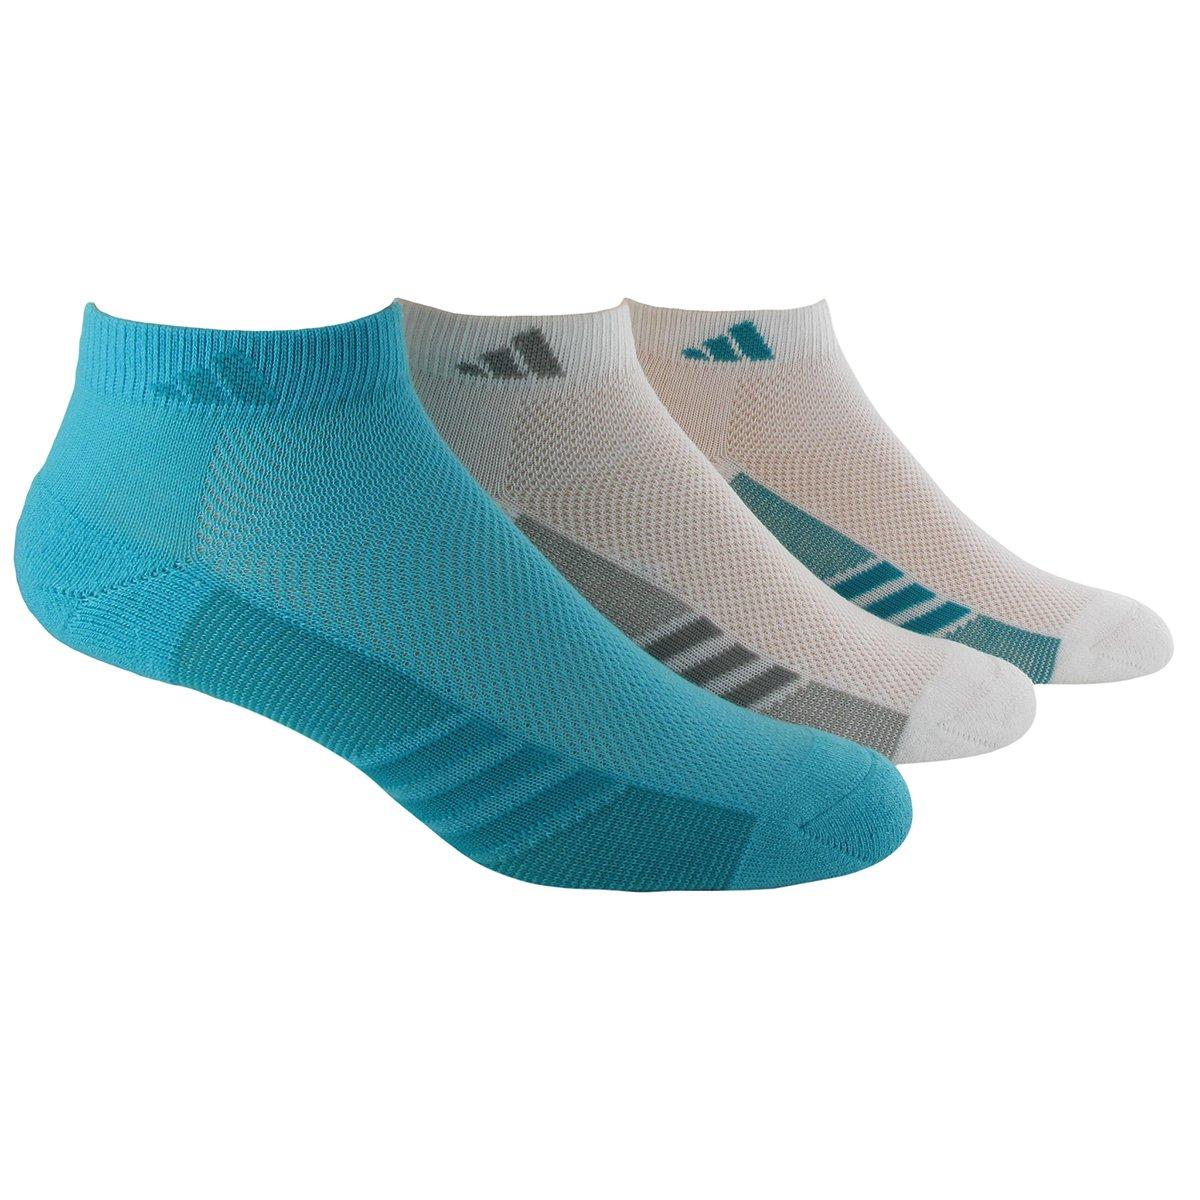 adidas Women's Superlite Low Cut Socks (Pack of 3) adidas boys climacool x ii low cut socks pack of 2